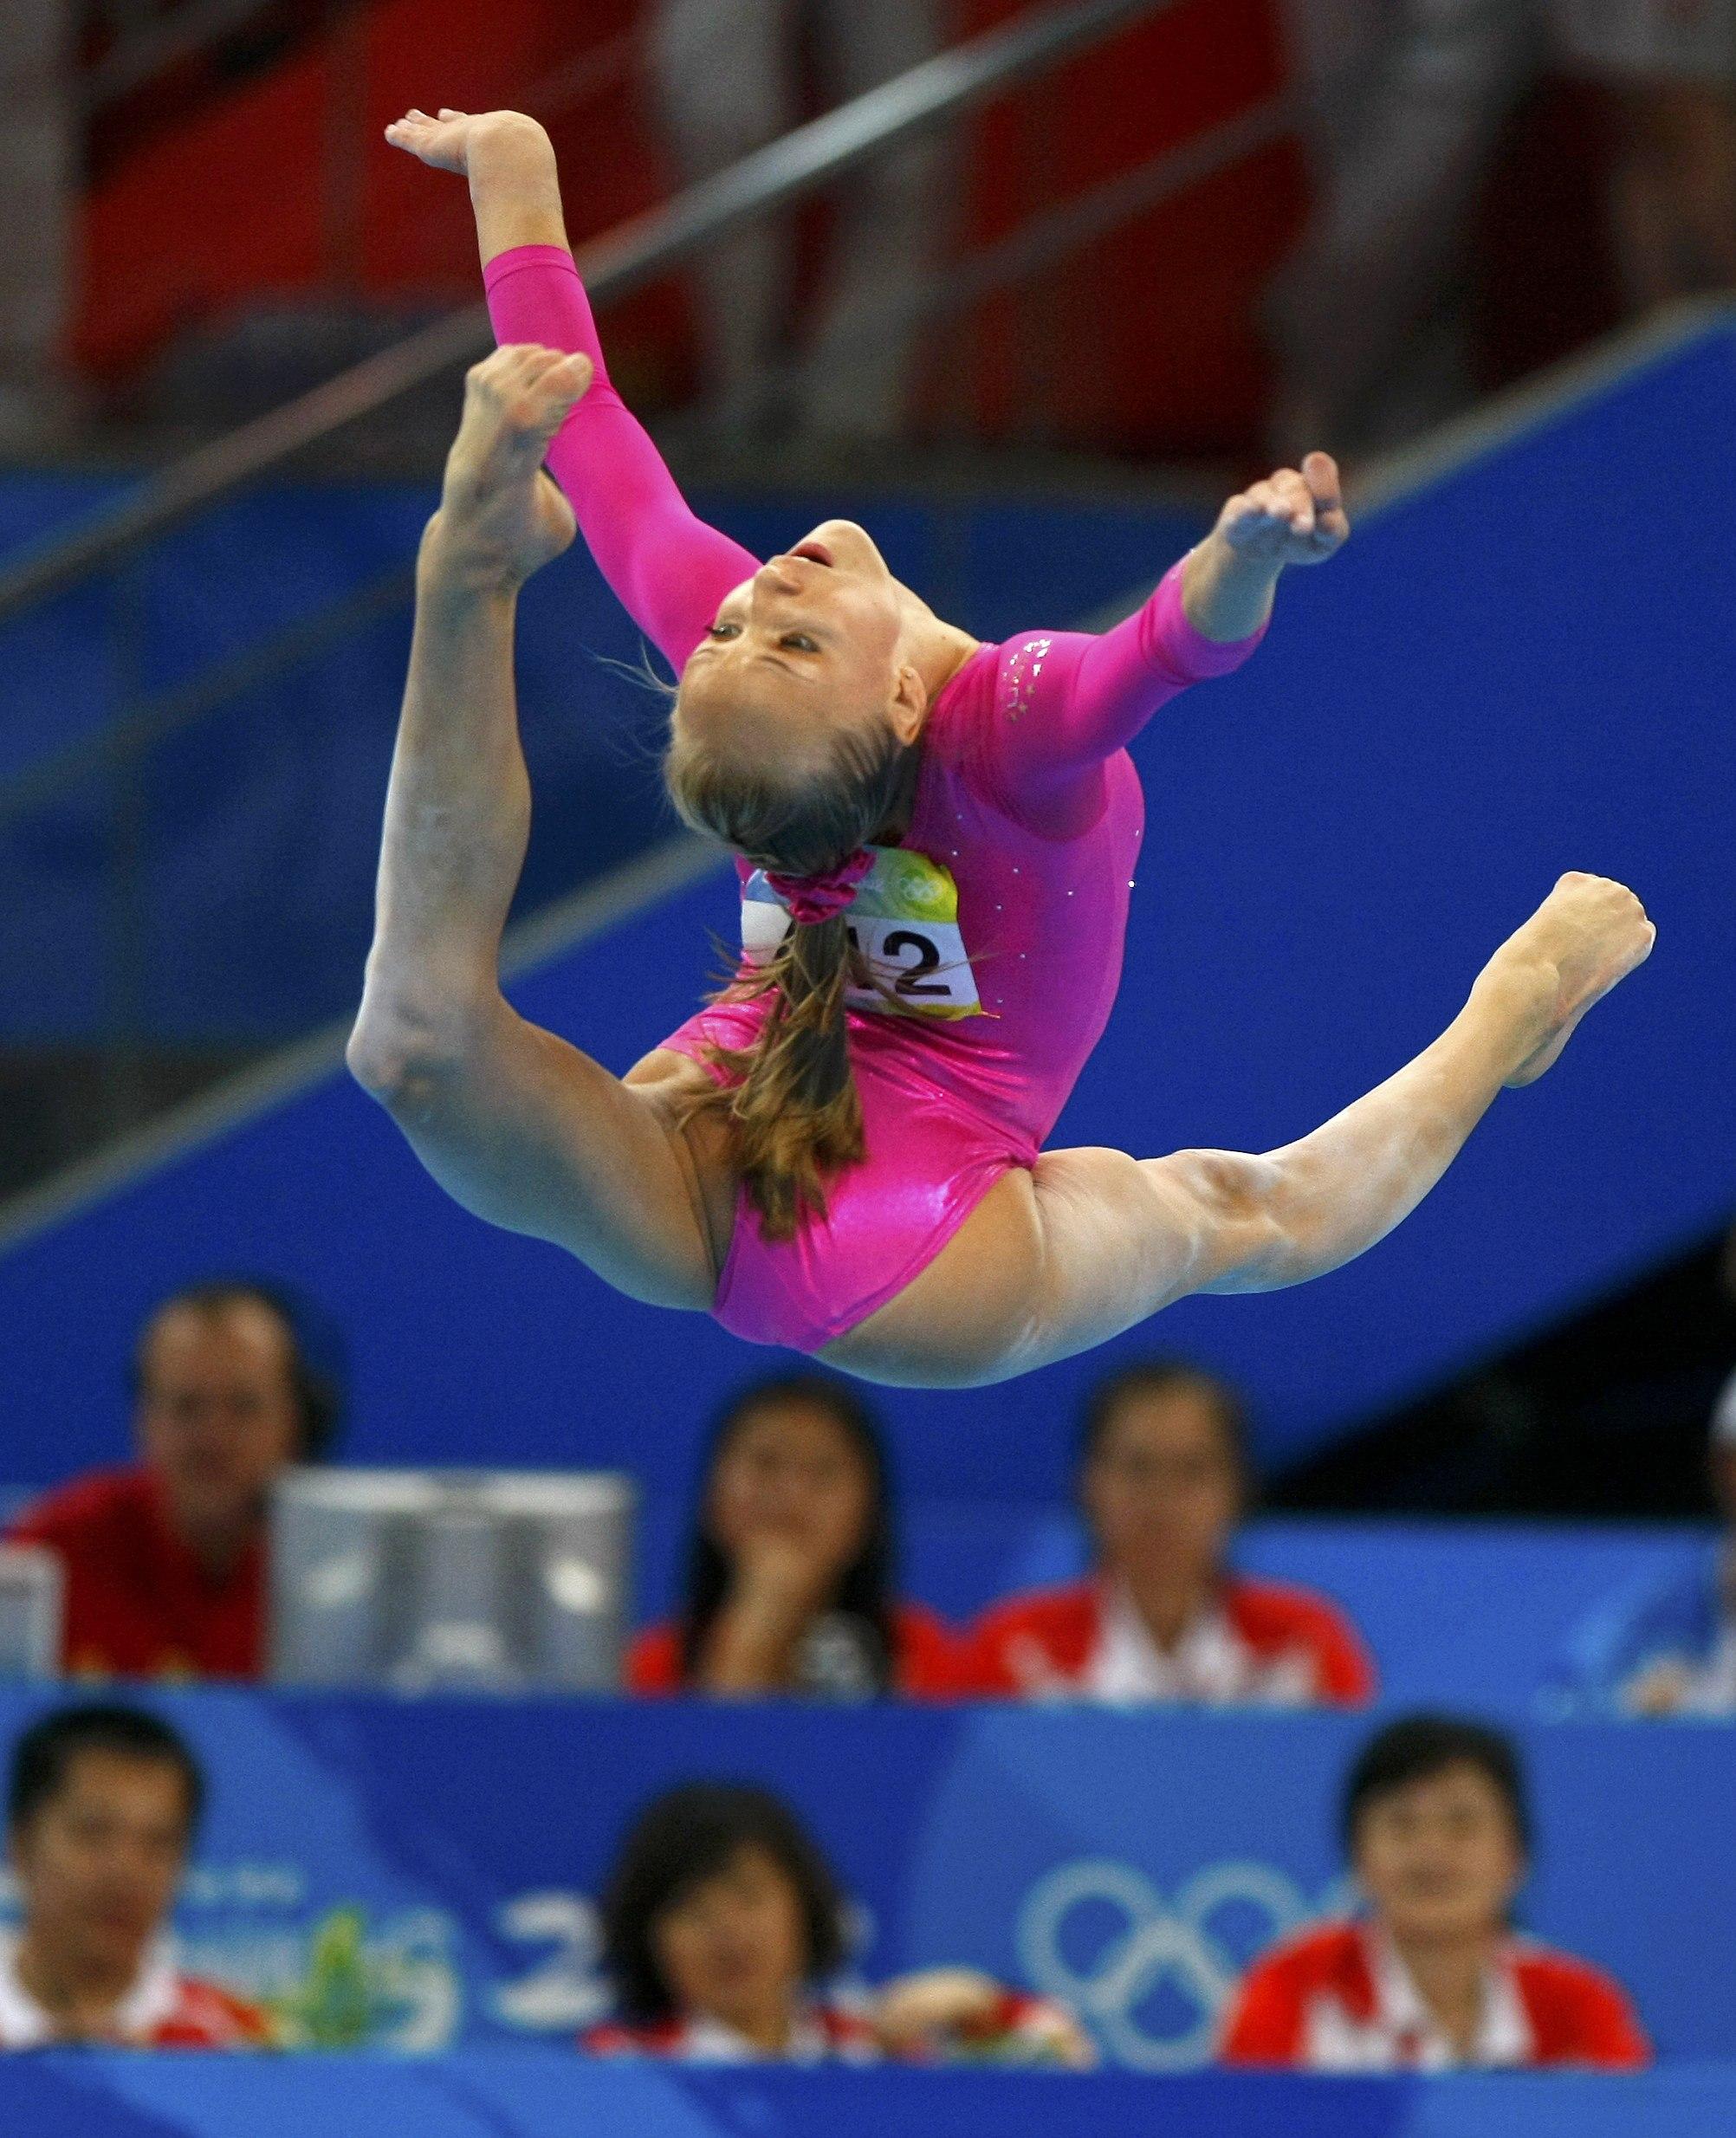 Пекин-2008, Настя Люкин, бег, спортивная гимнастика, Питер Одемвинги